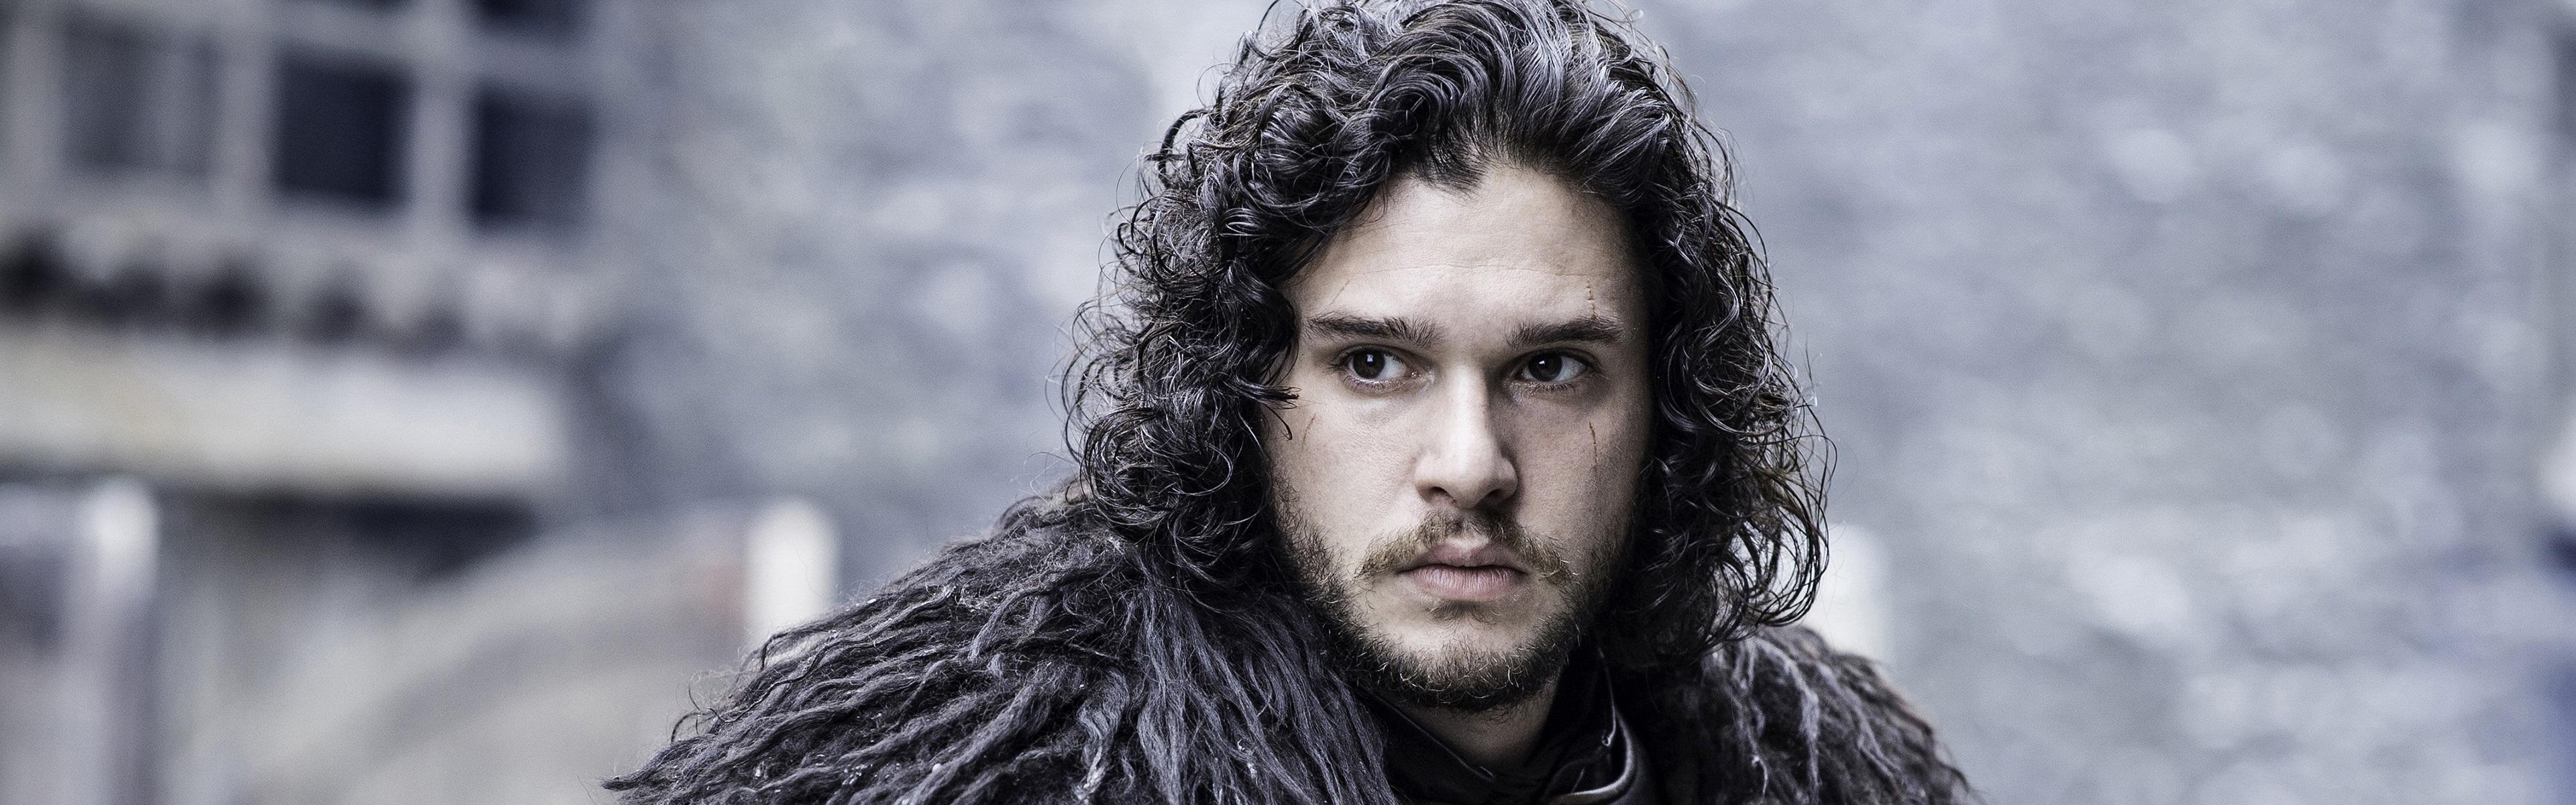 Jon Snow Season 7 Game Of Thrones - HD Wallpaper